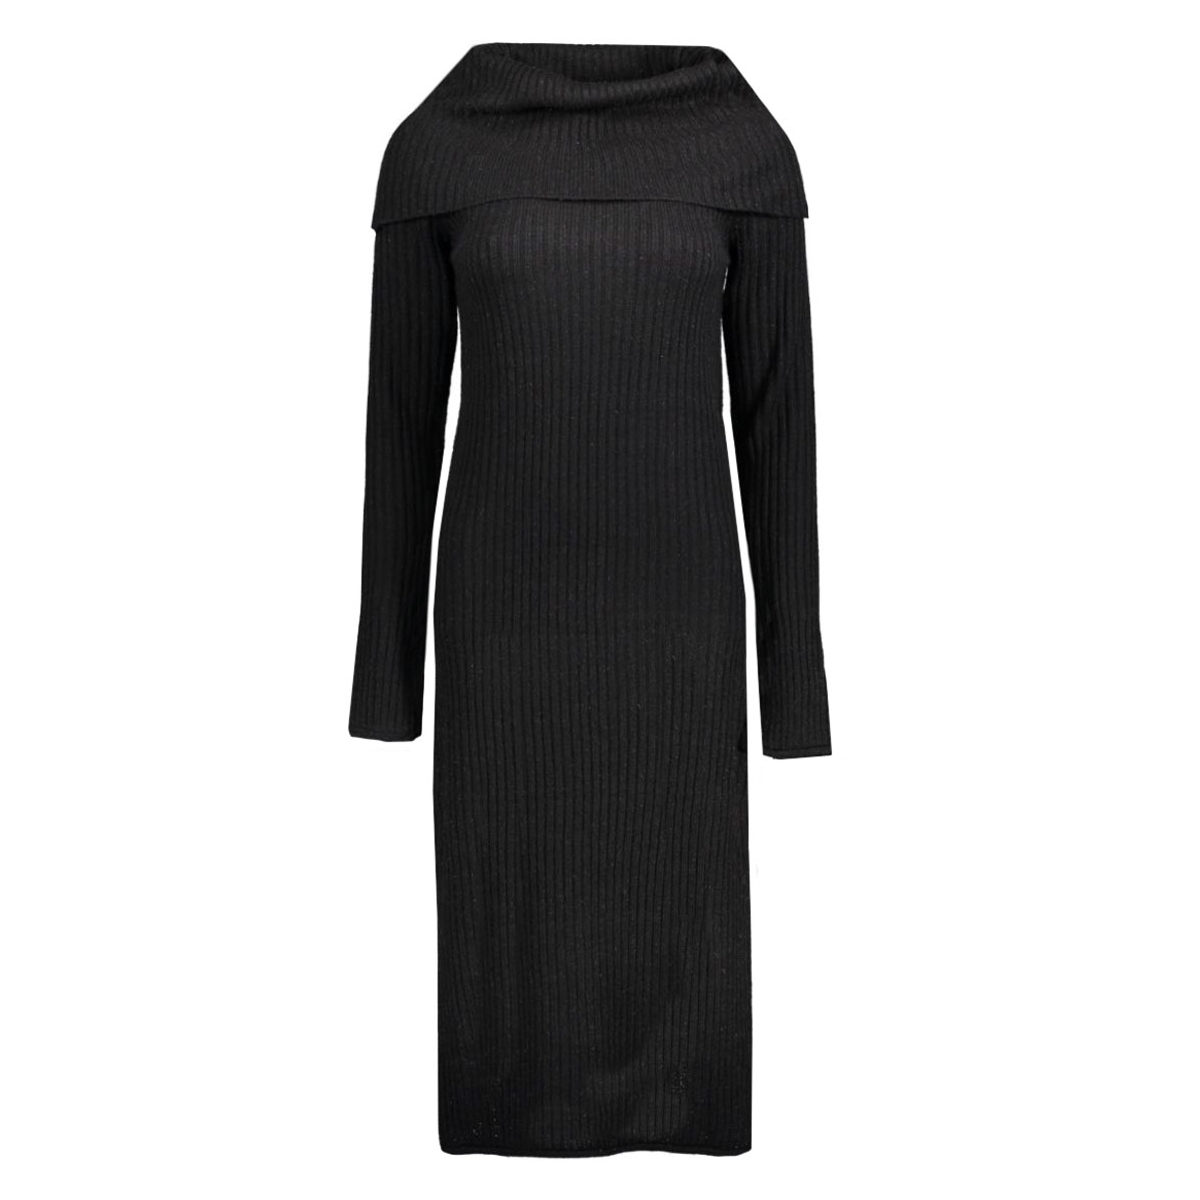 virib l/s knit dress 14036833 vila jurk black